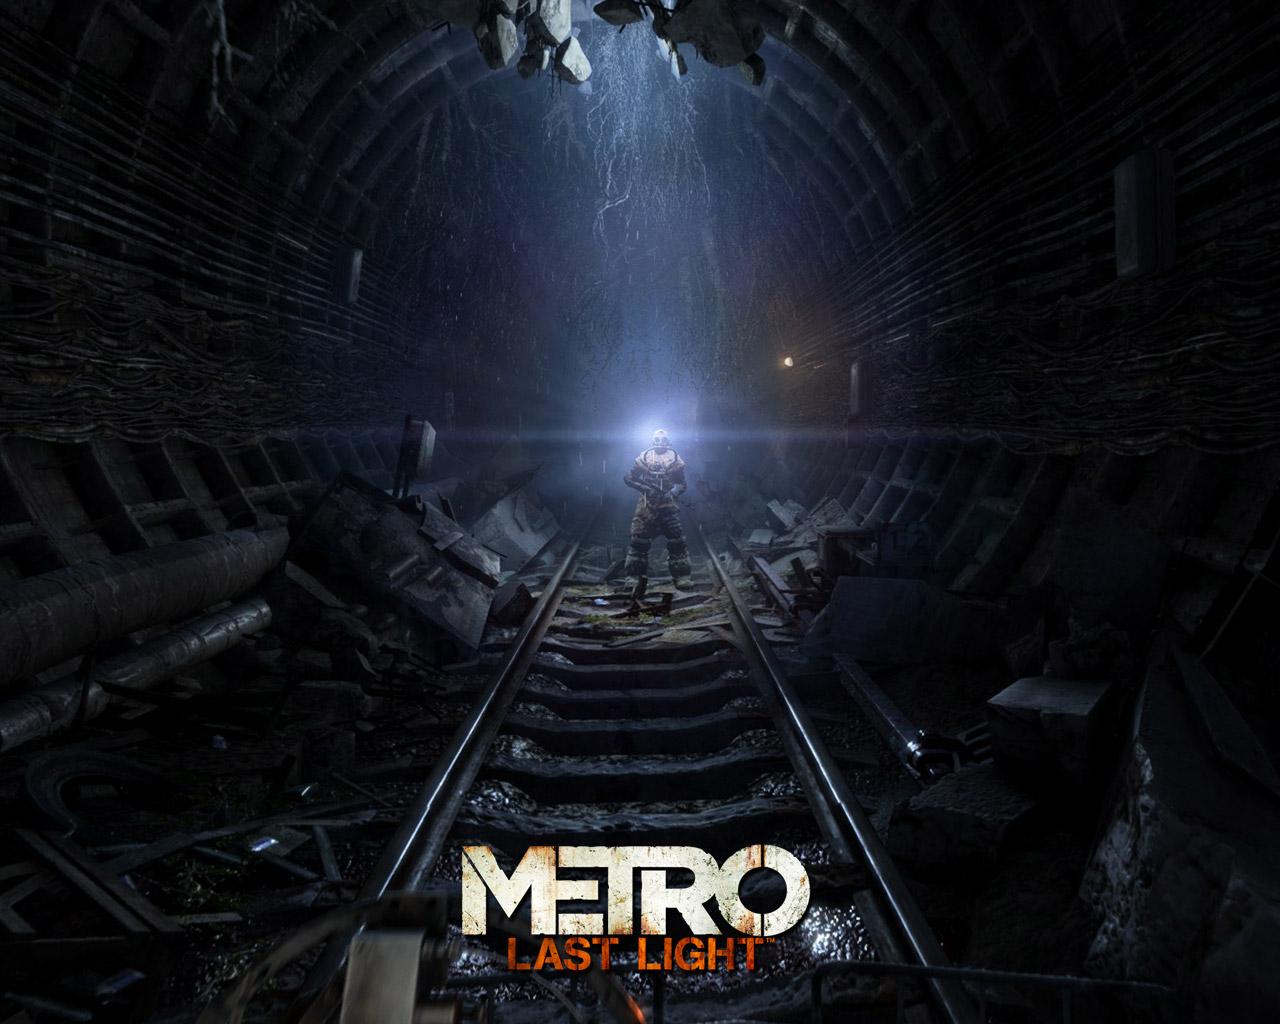 Free Metro: Last Light Wallpaper in 1280x1024